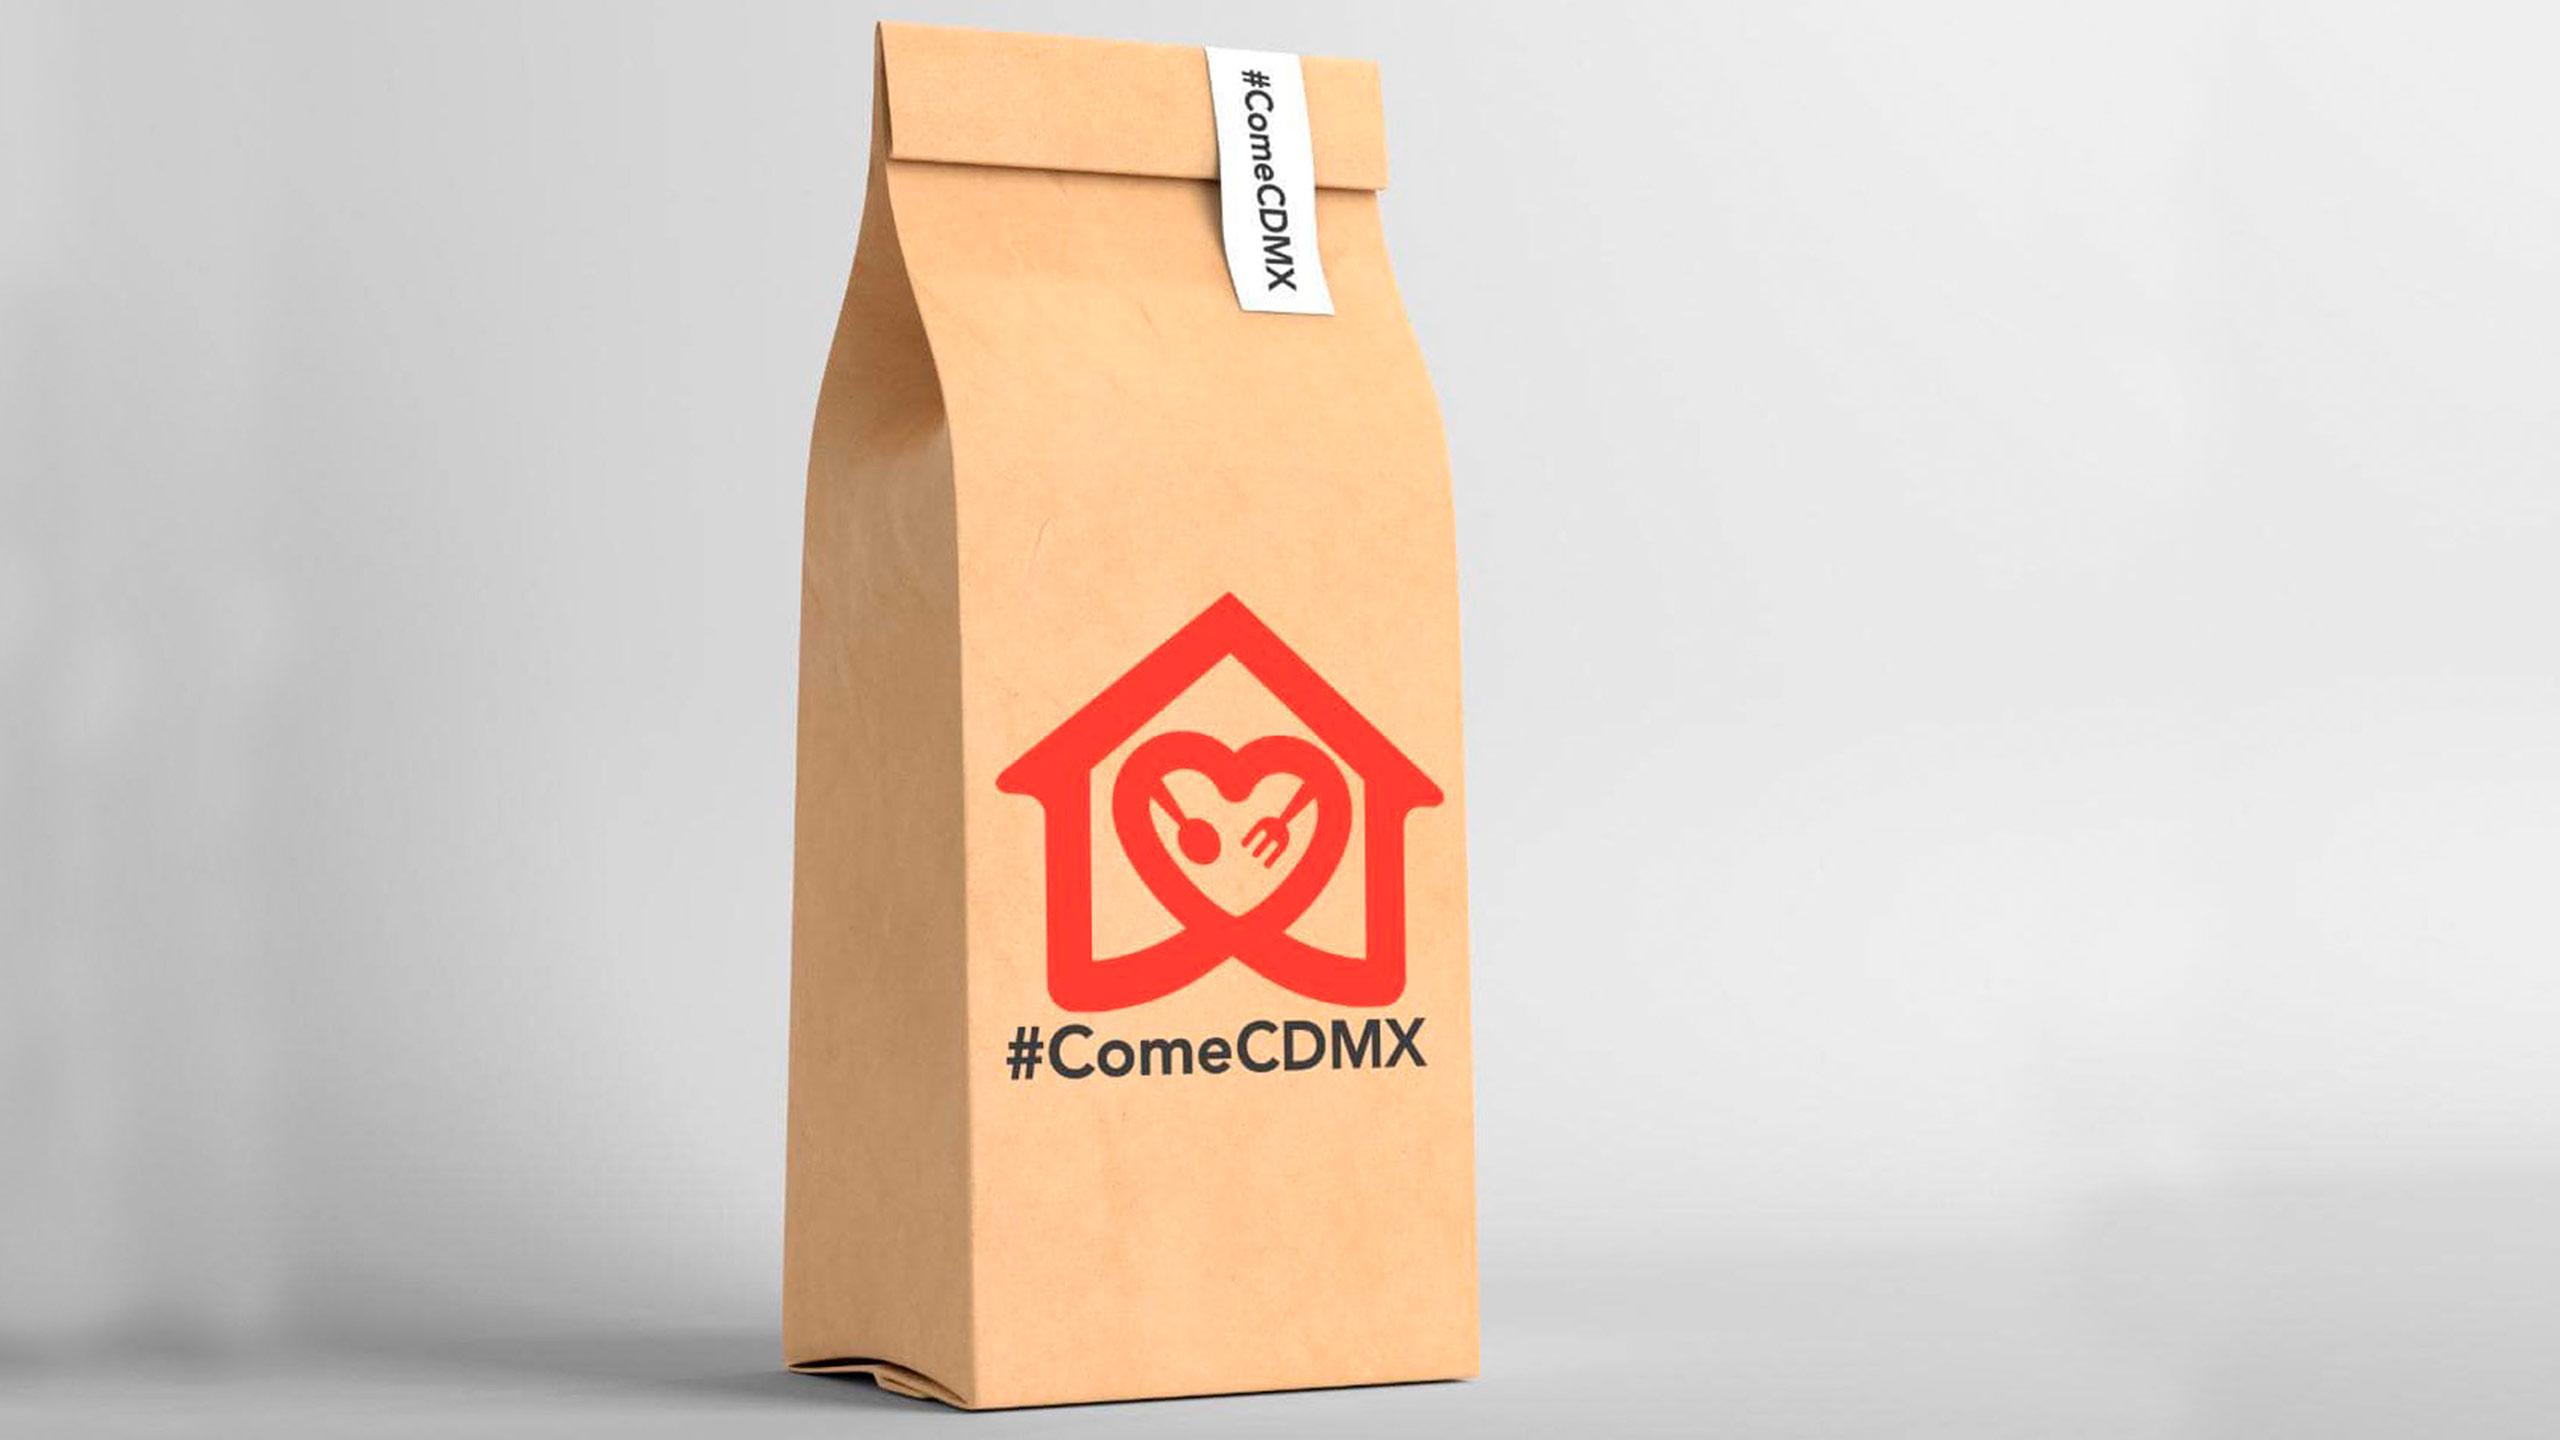 #comecdmx